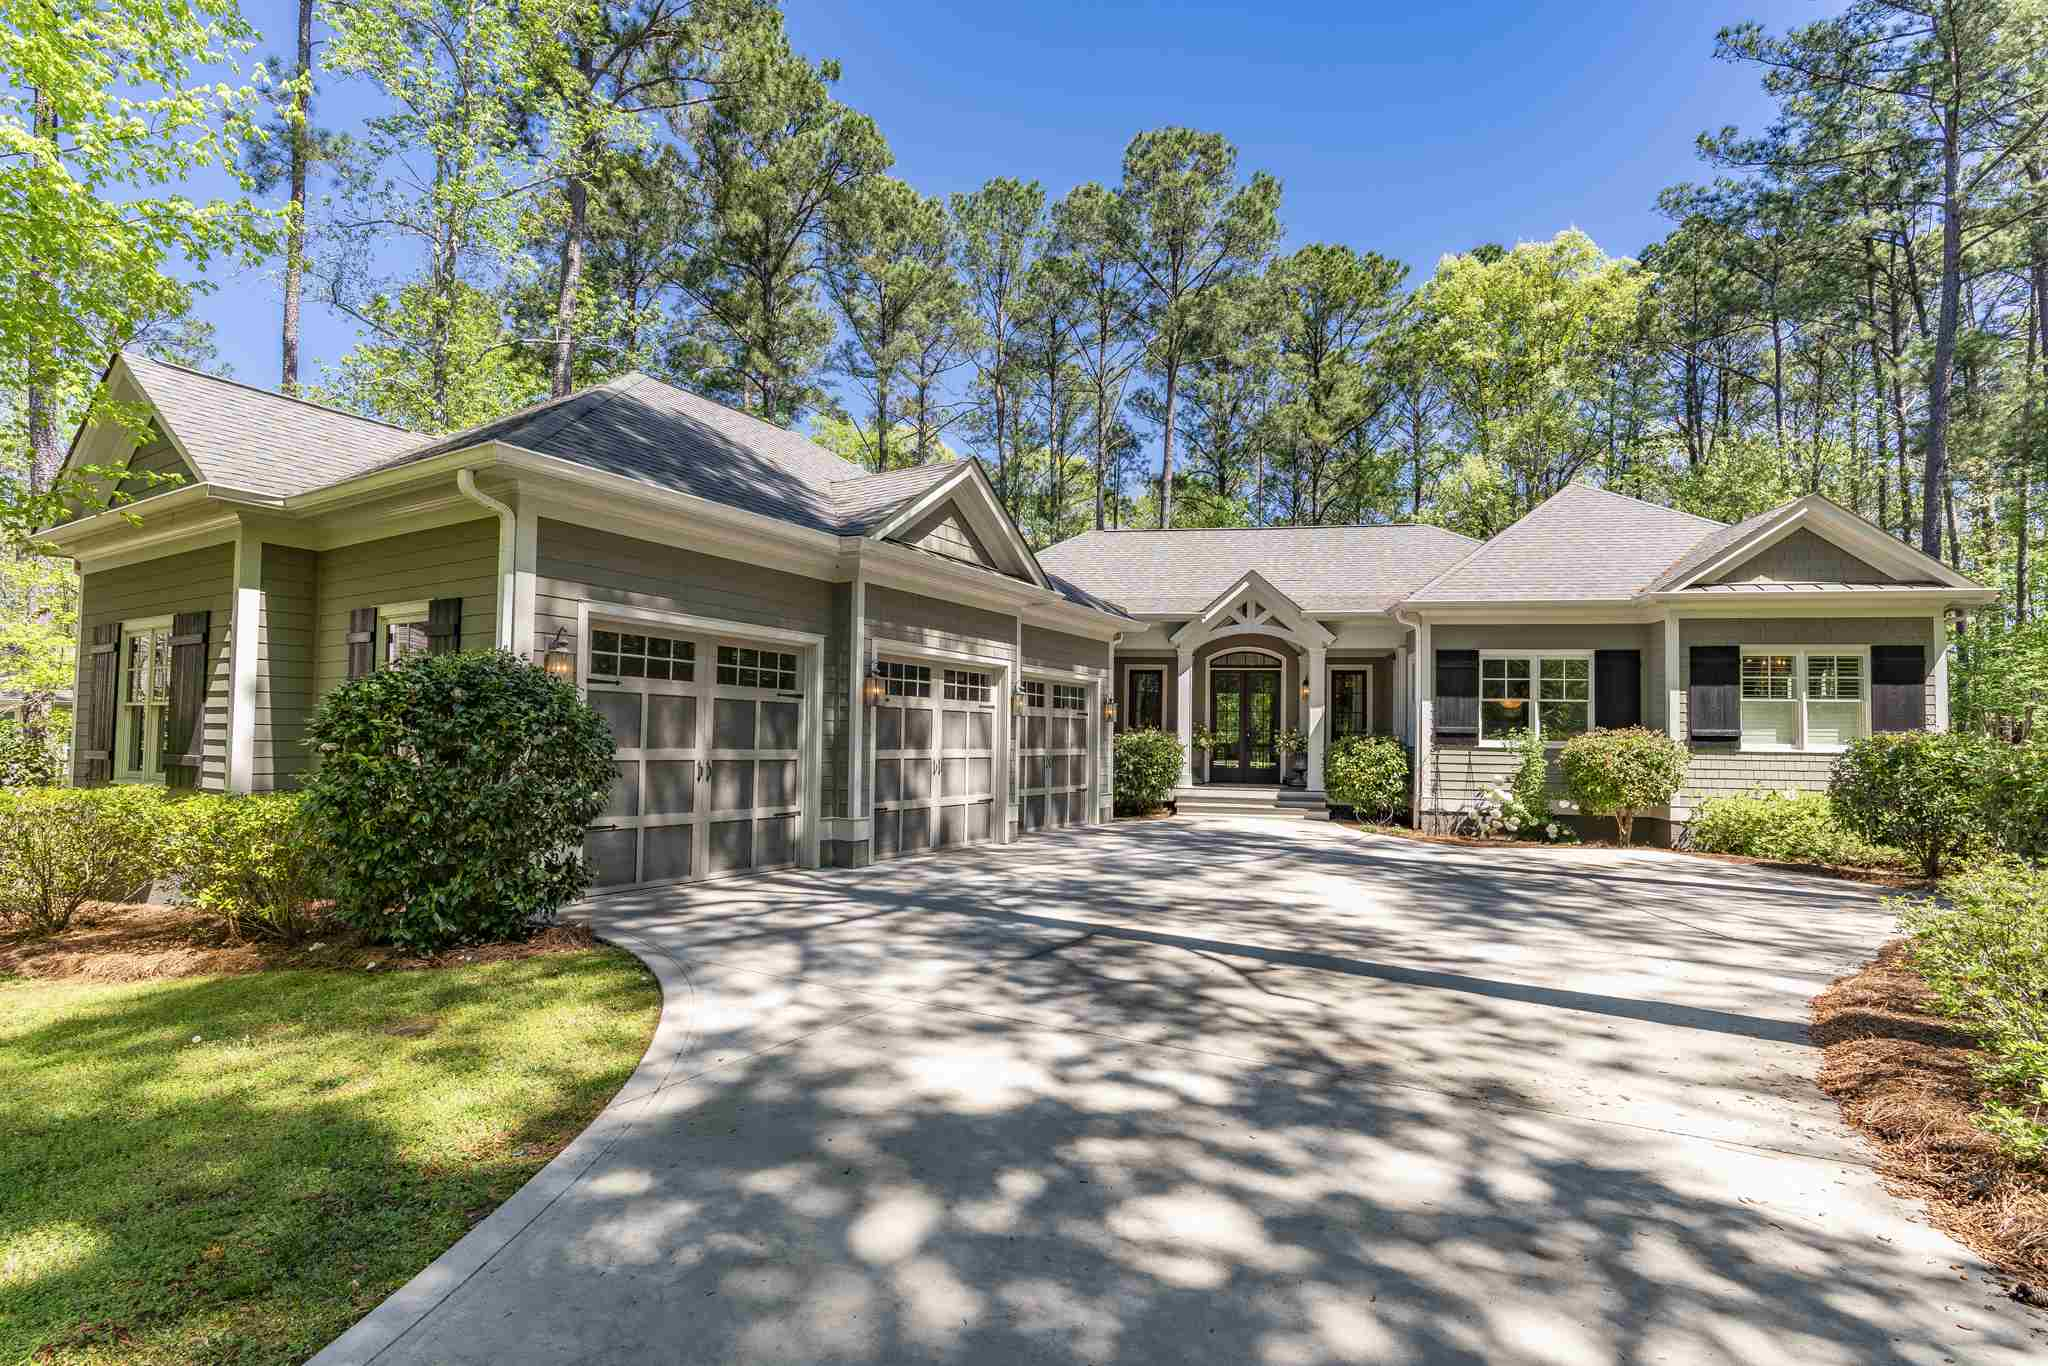 1780 SNUG HARBOR DRIVE, Lake Oconee Reynolds Landing in Greene County, GA 30642 Home for Sale